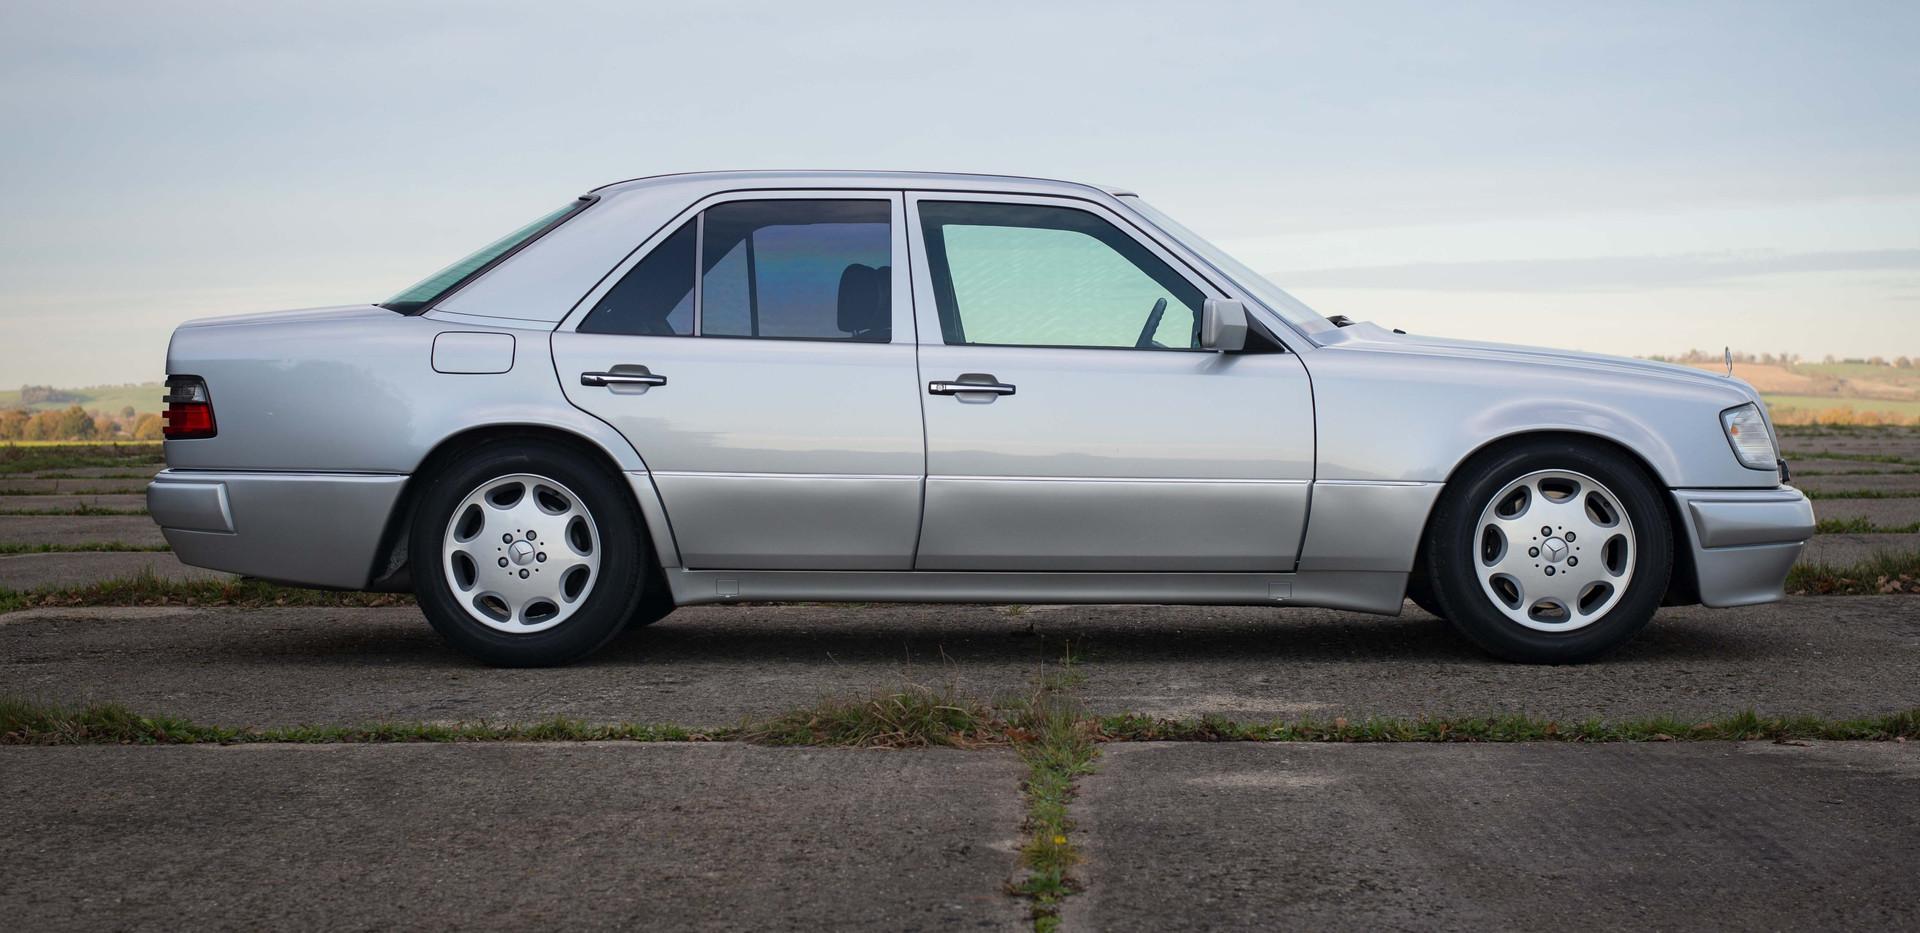 Mercedes W124 E500 For Sale UK London  (